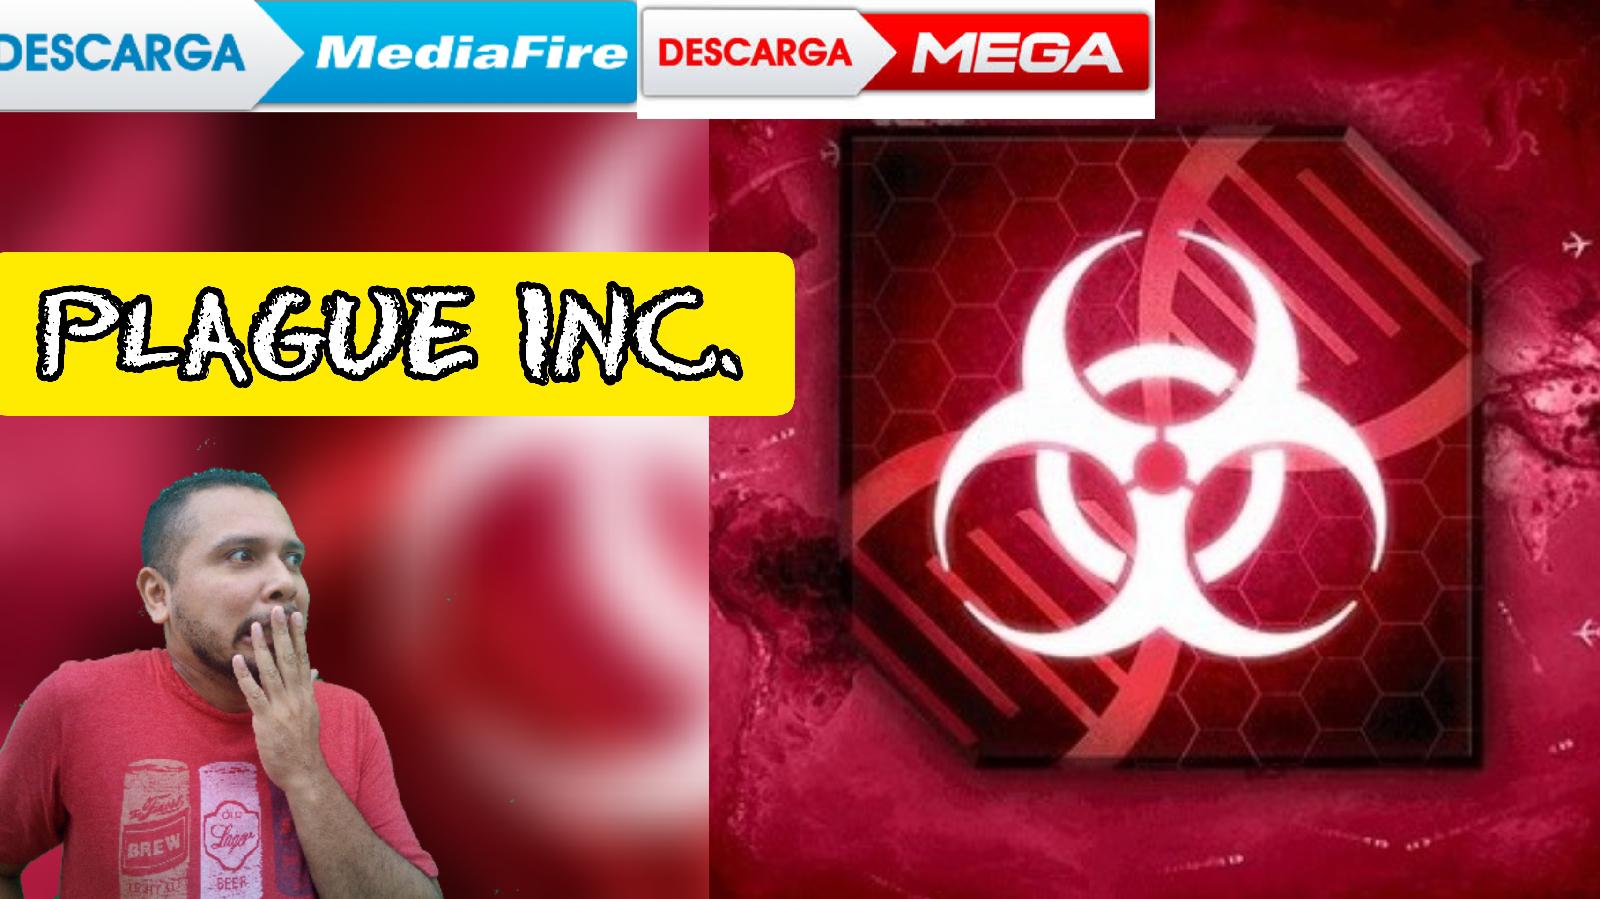 Hugo YouKnow DESCARGA TODO HACK: DESCARGA Plague Inc. APK ...